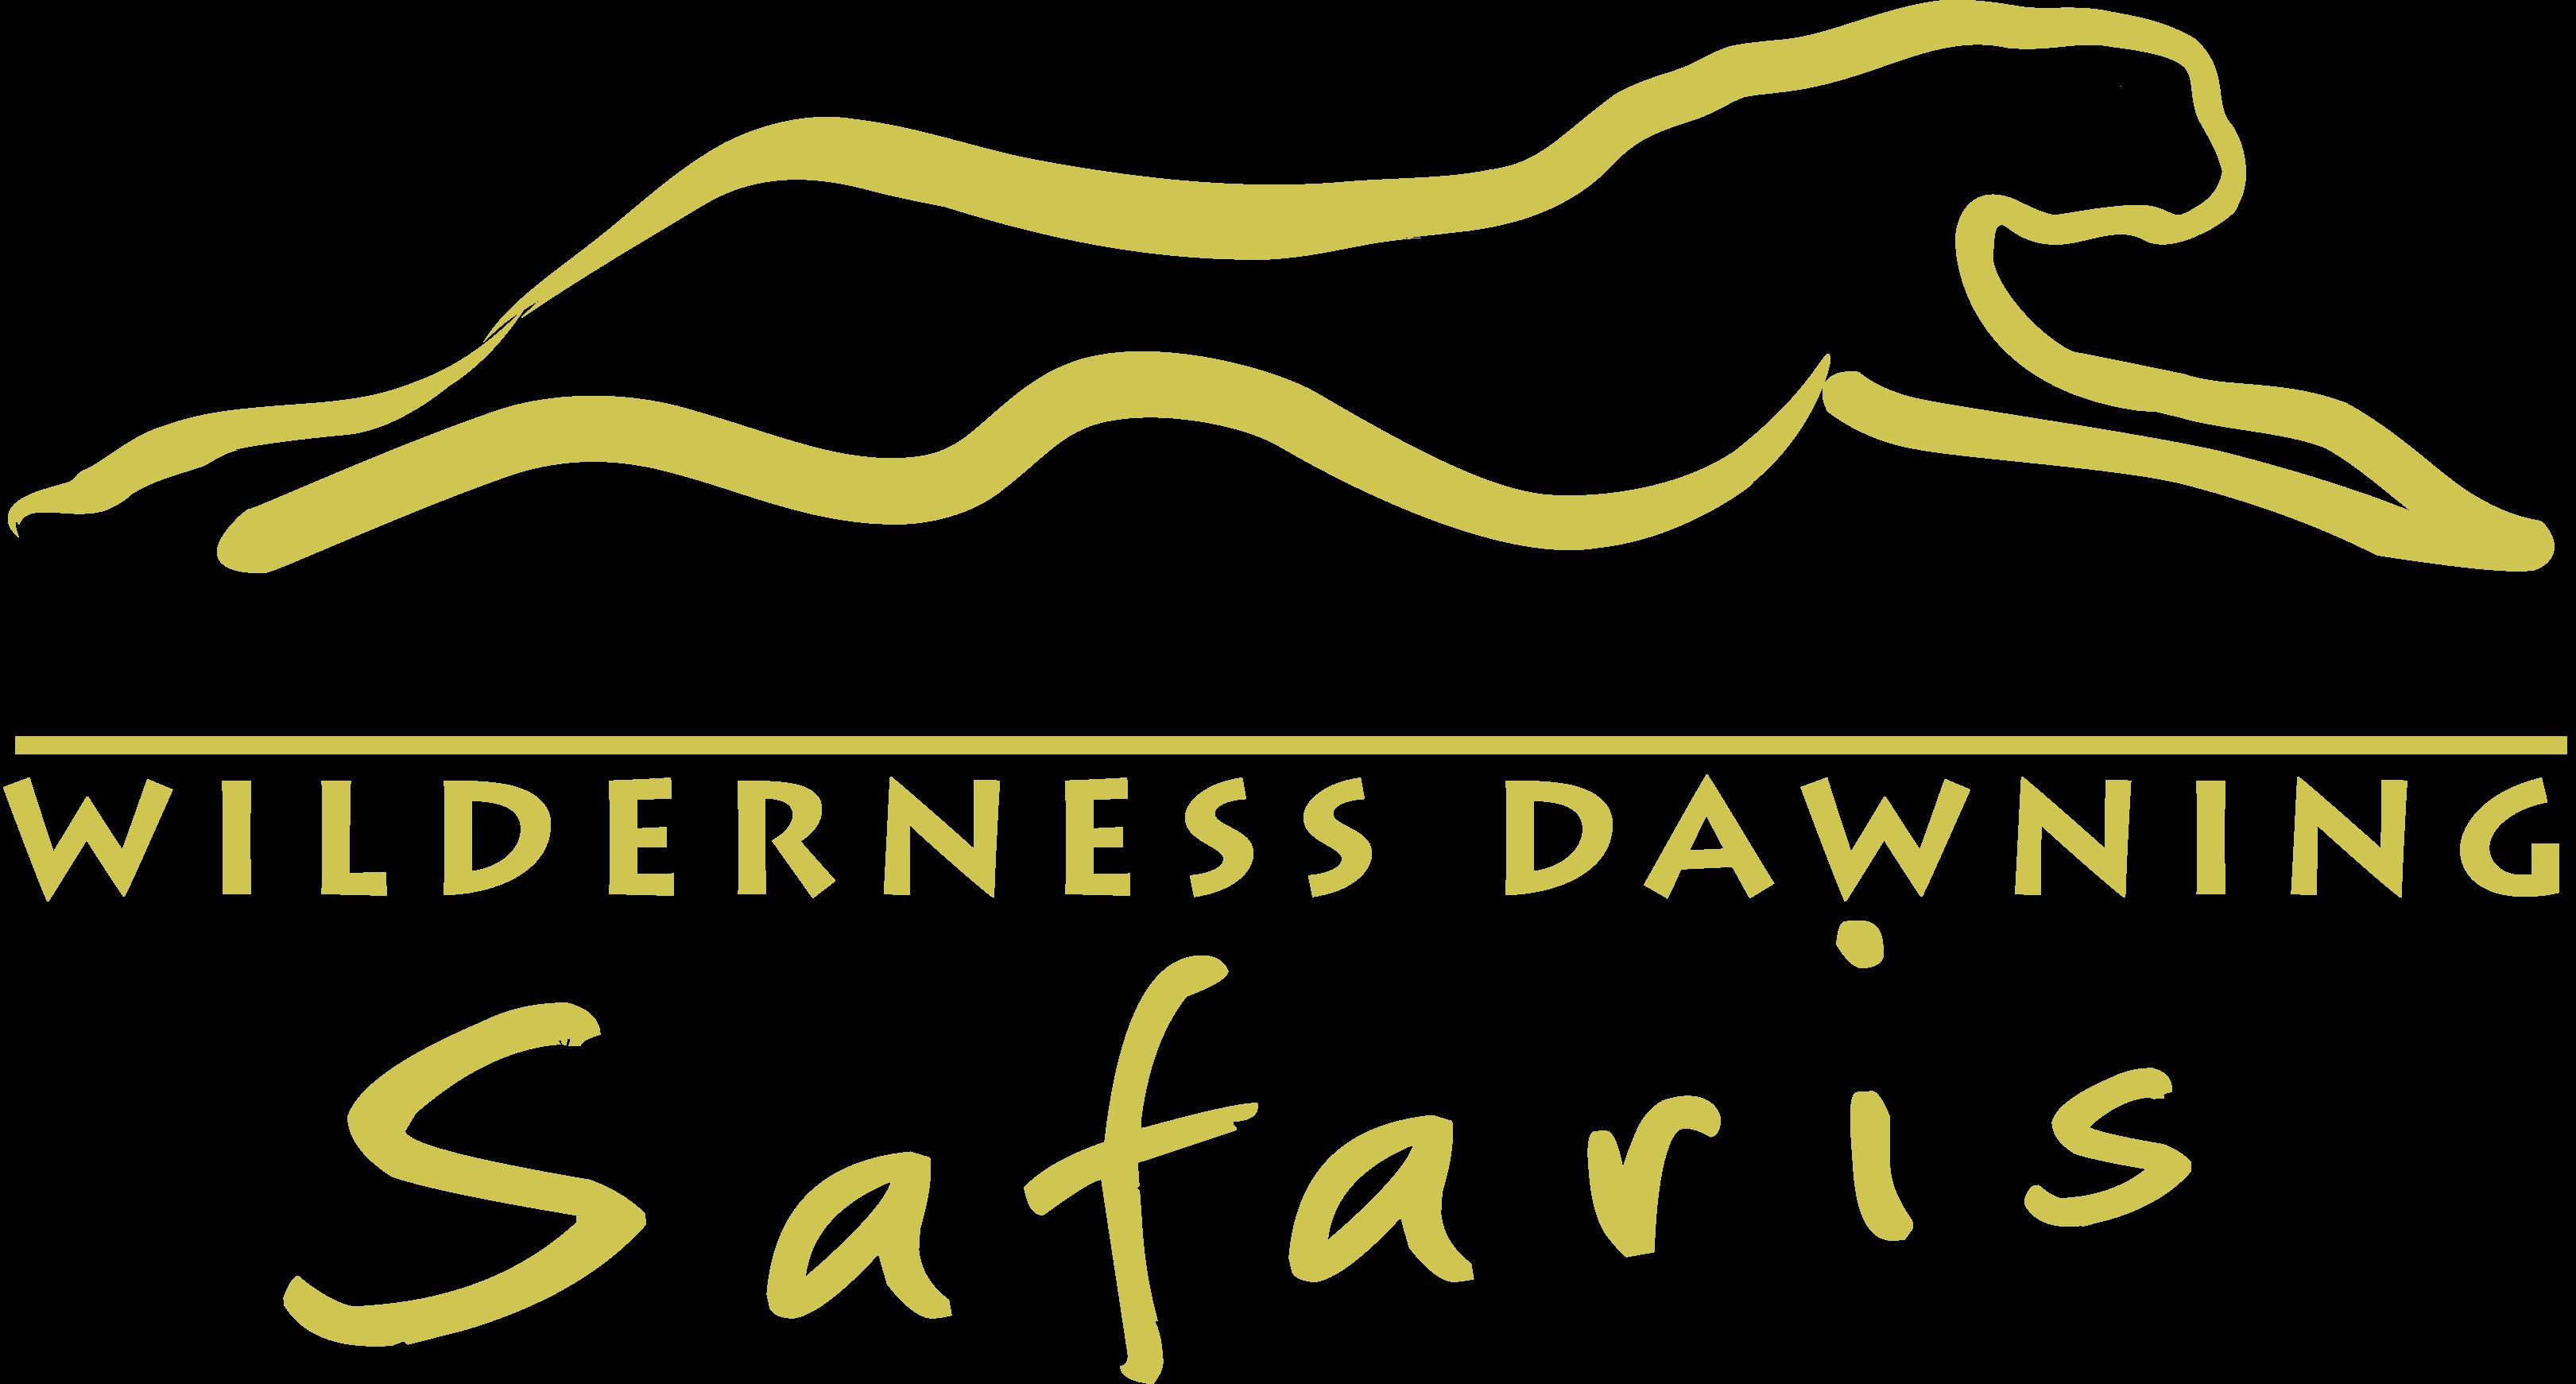 Wilderness Dawning Safaris